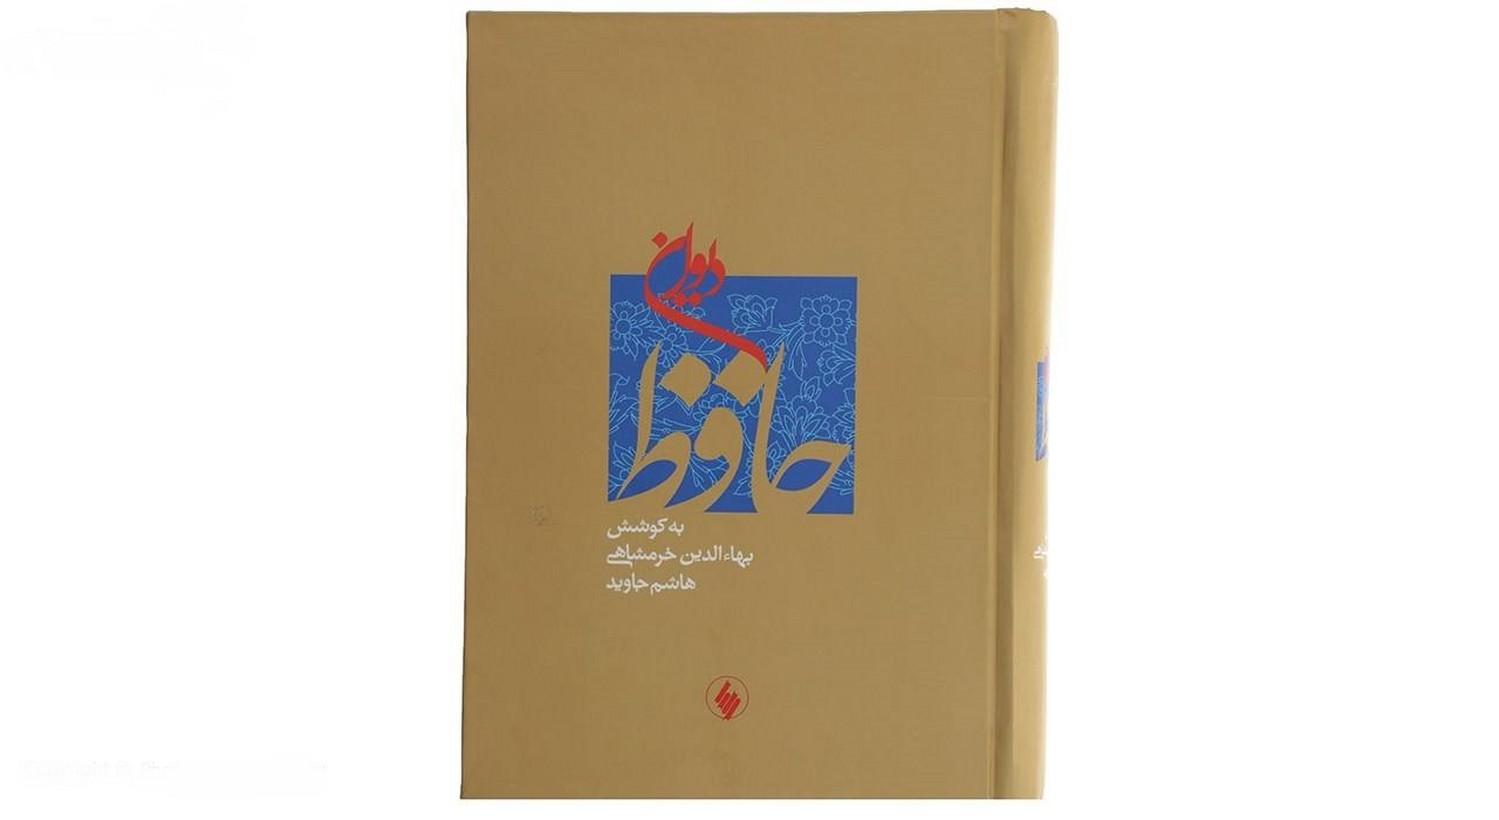 ديوان-حافظ-جاويد-(فرزان-روز)-وزيري-قابدار